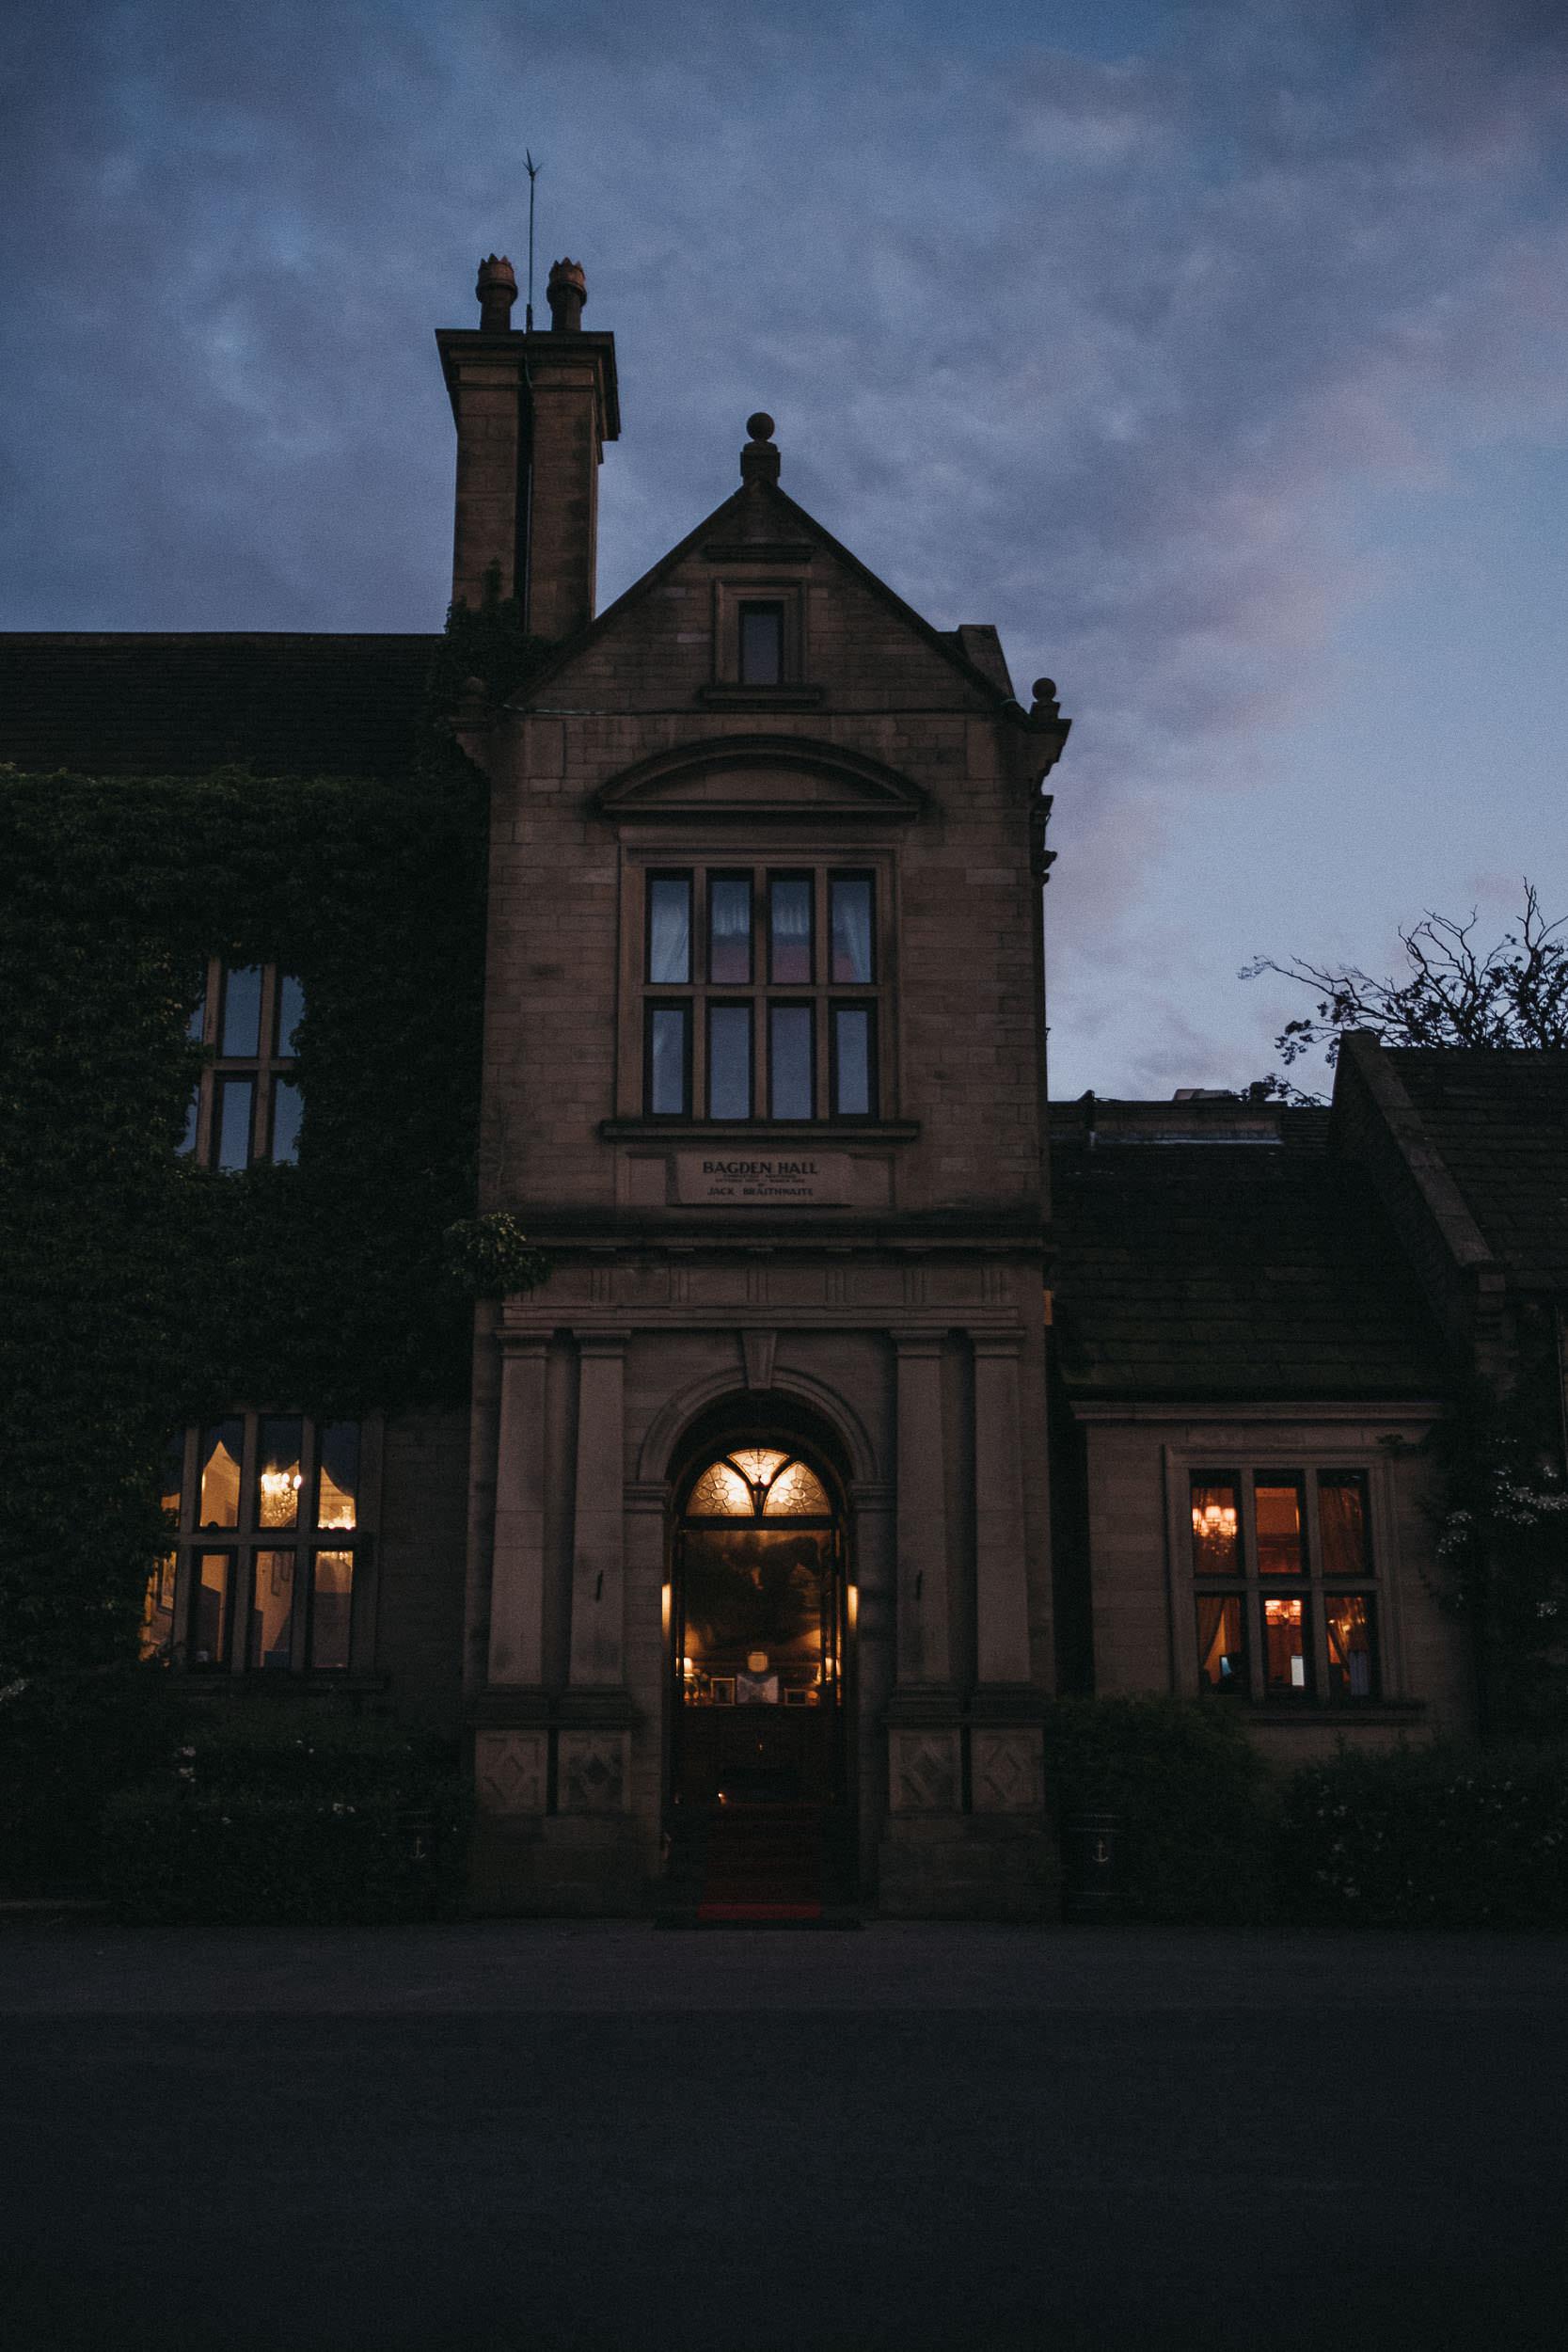 Exterior of Bagden Hall at night